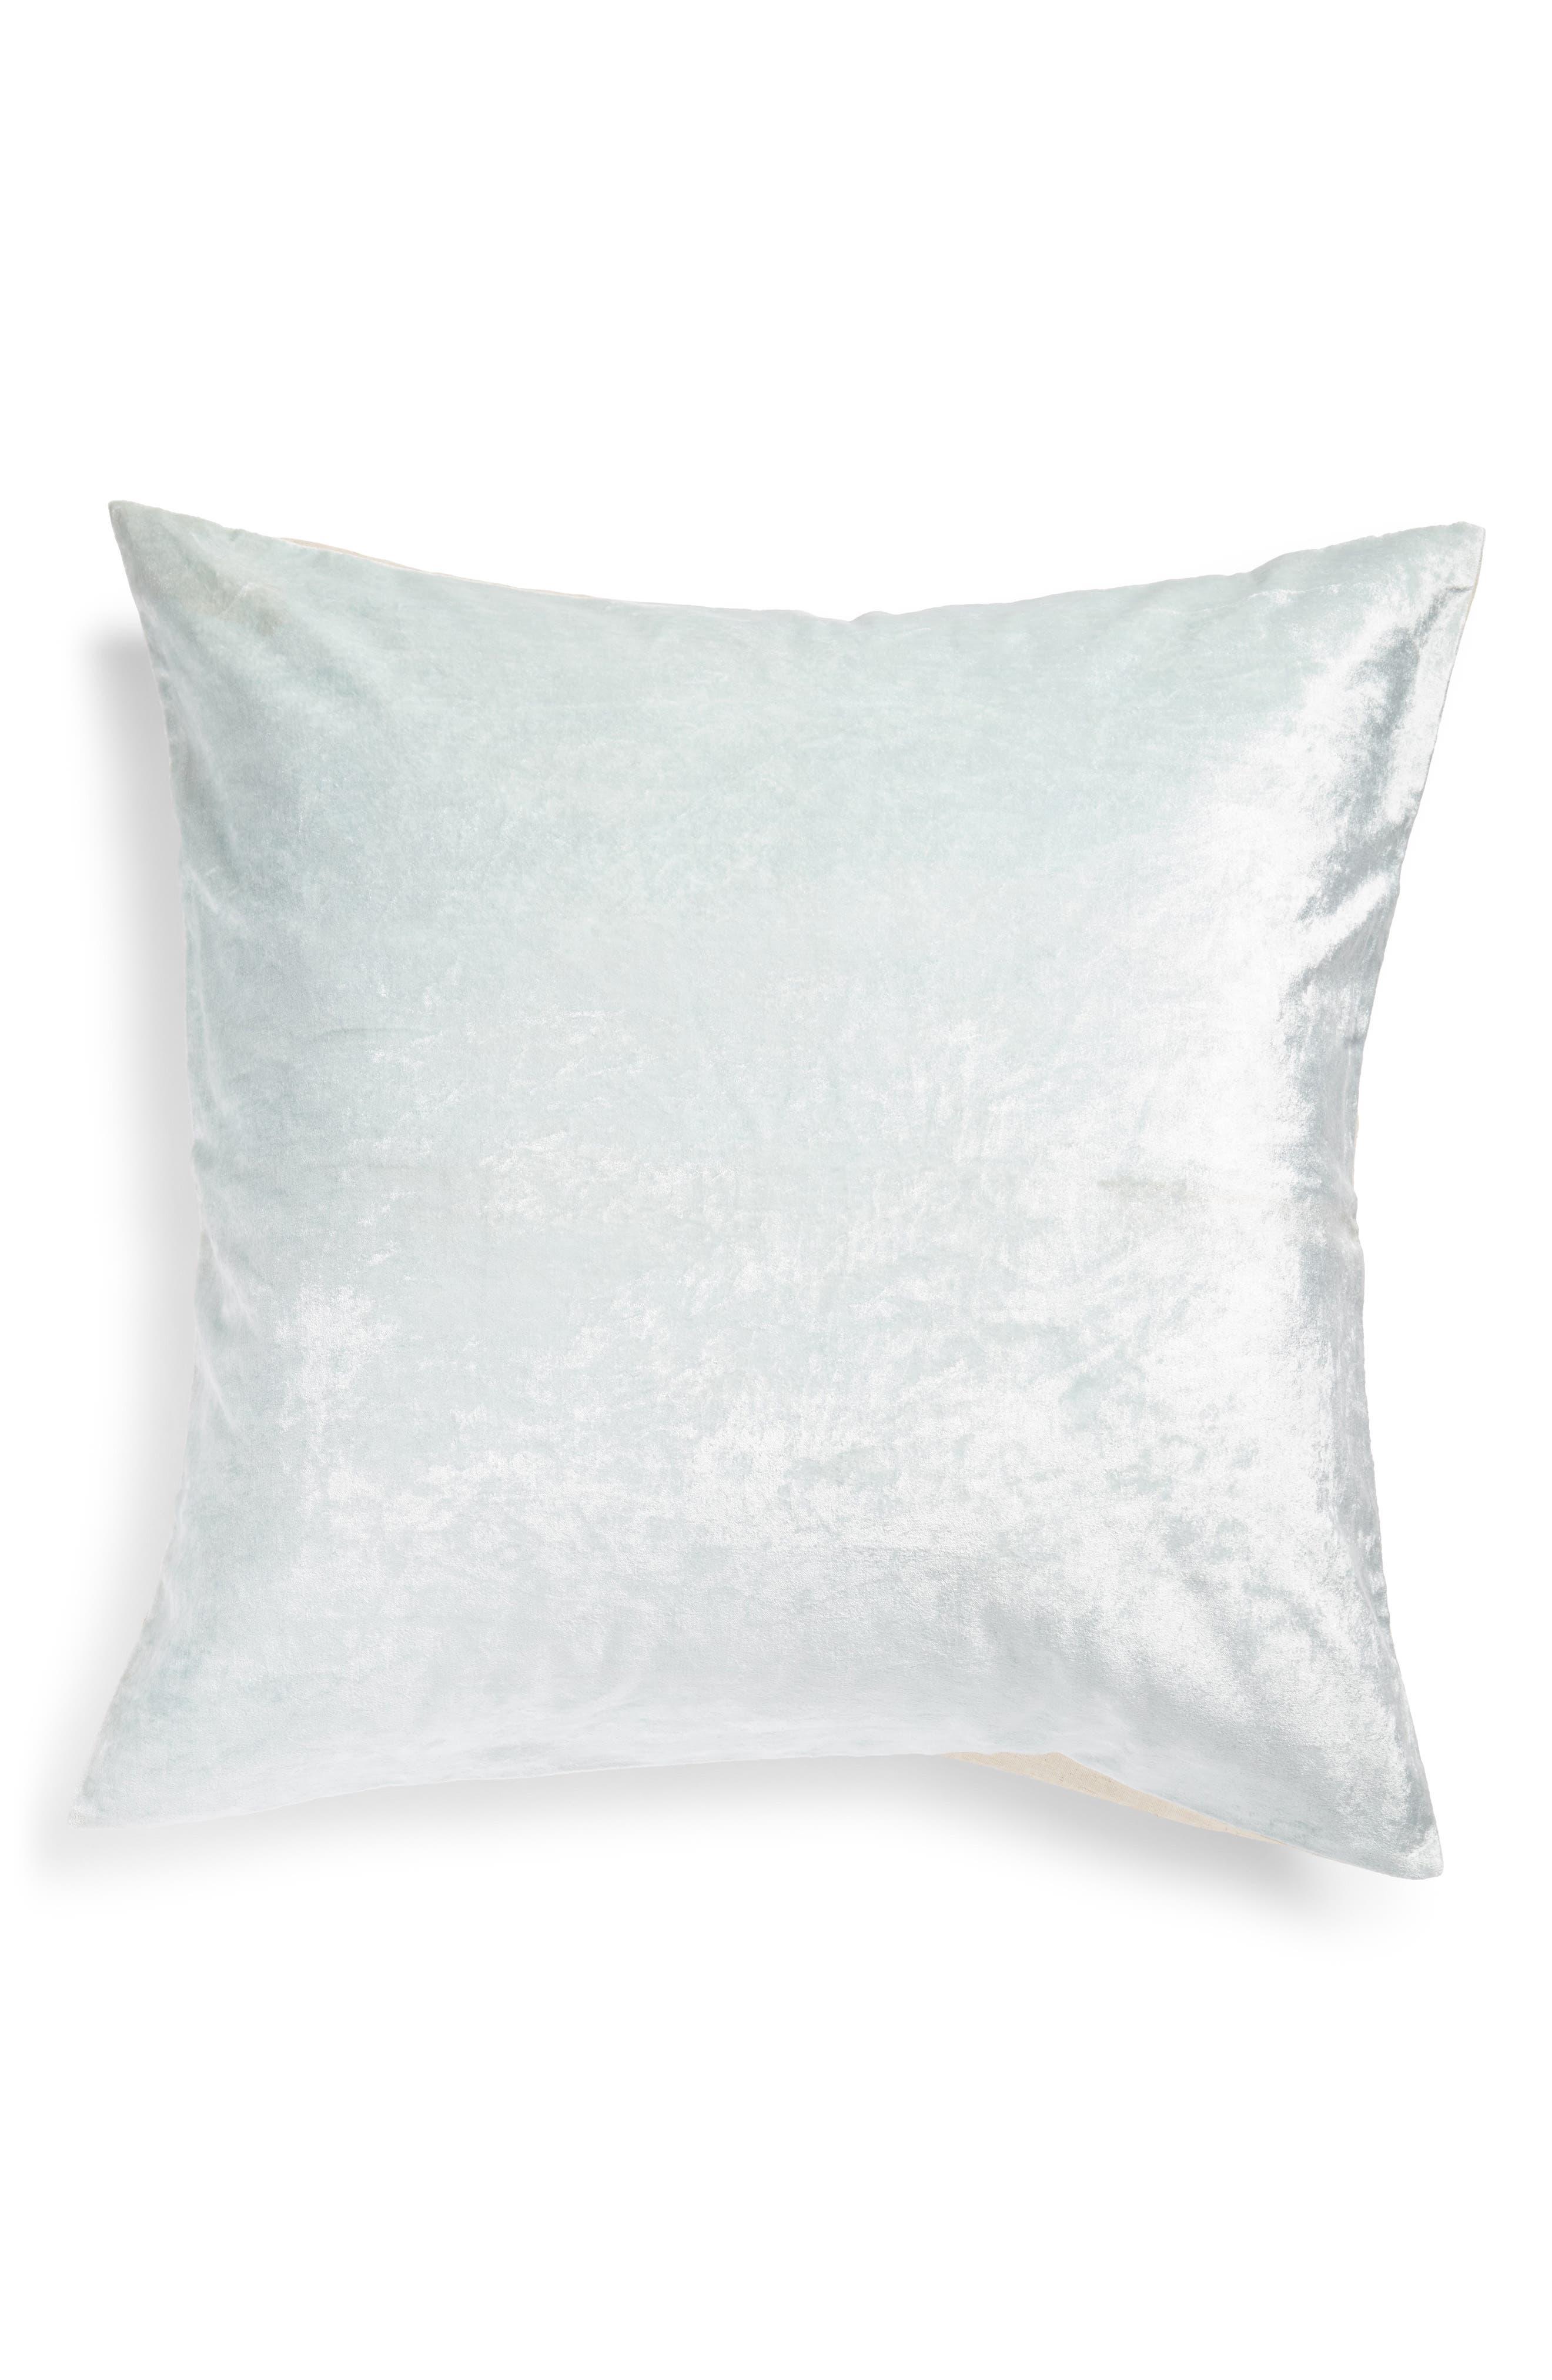 NORDSTROM AT HOME Shimmer Velvet Euro Sham, Main, color, TEAL STEAM